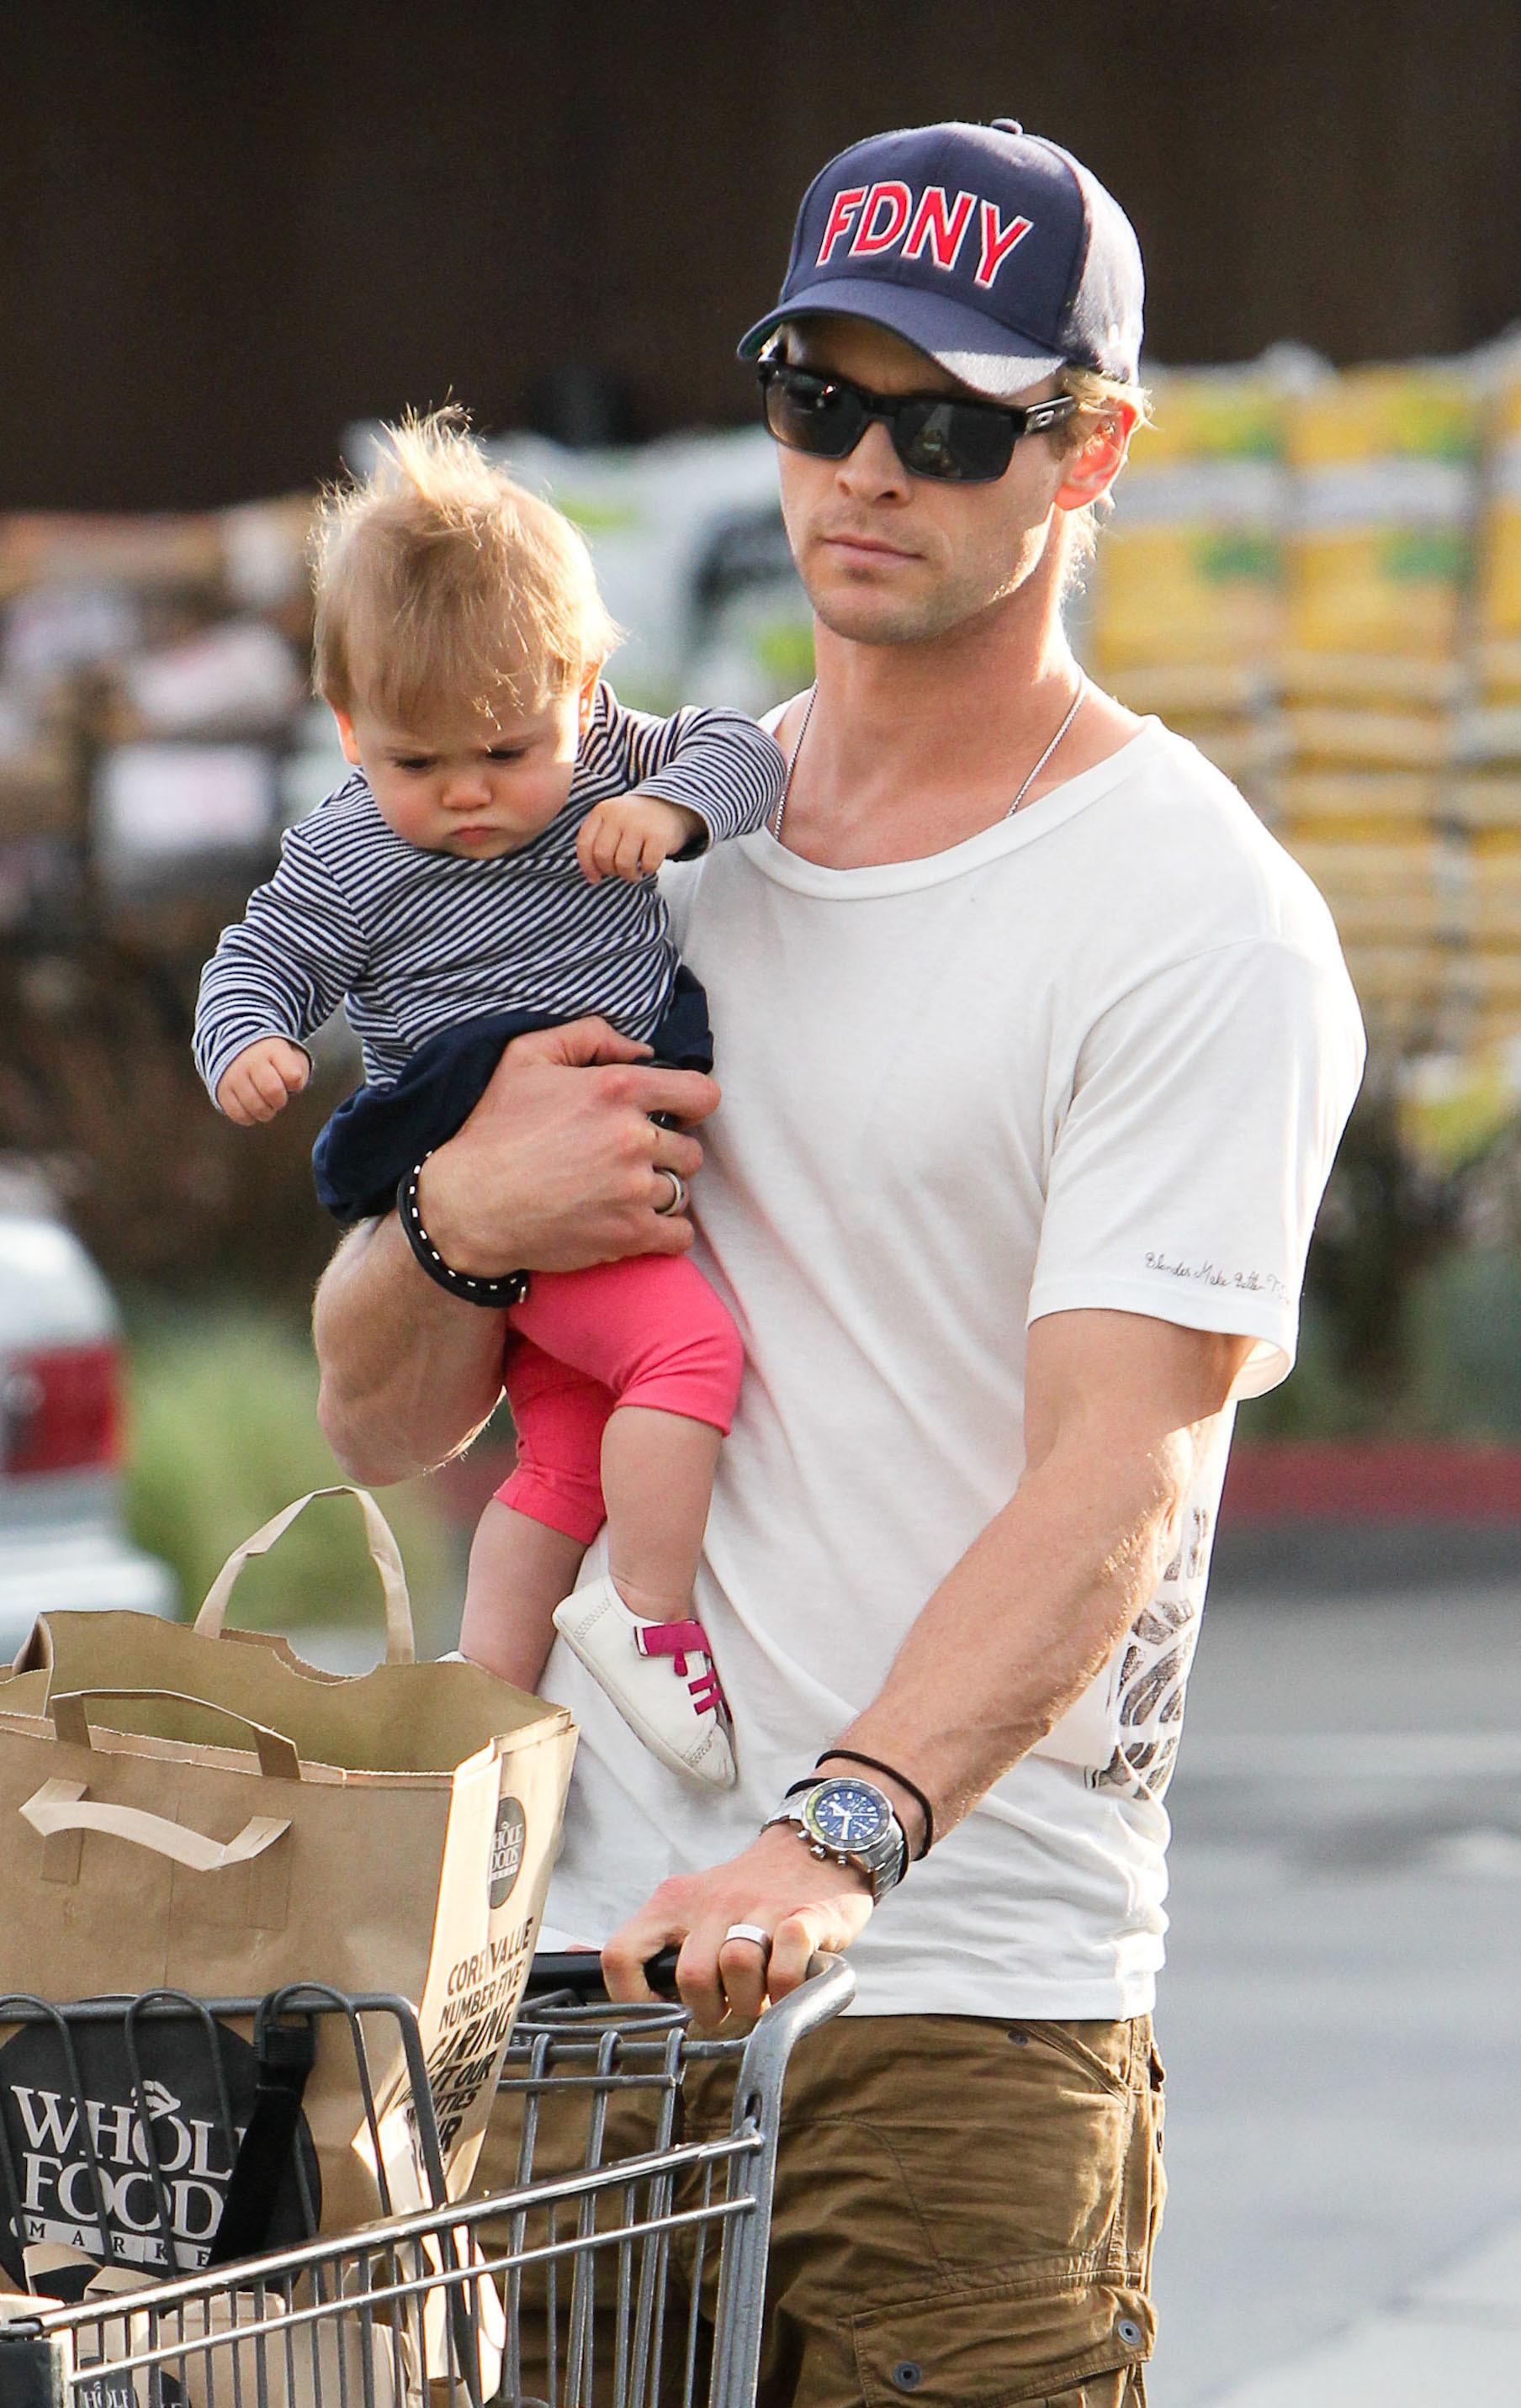 Chris Hemsworth shopping India